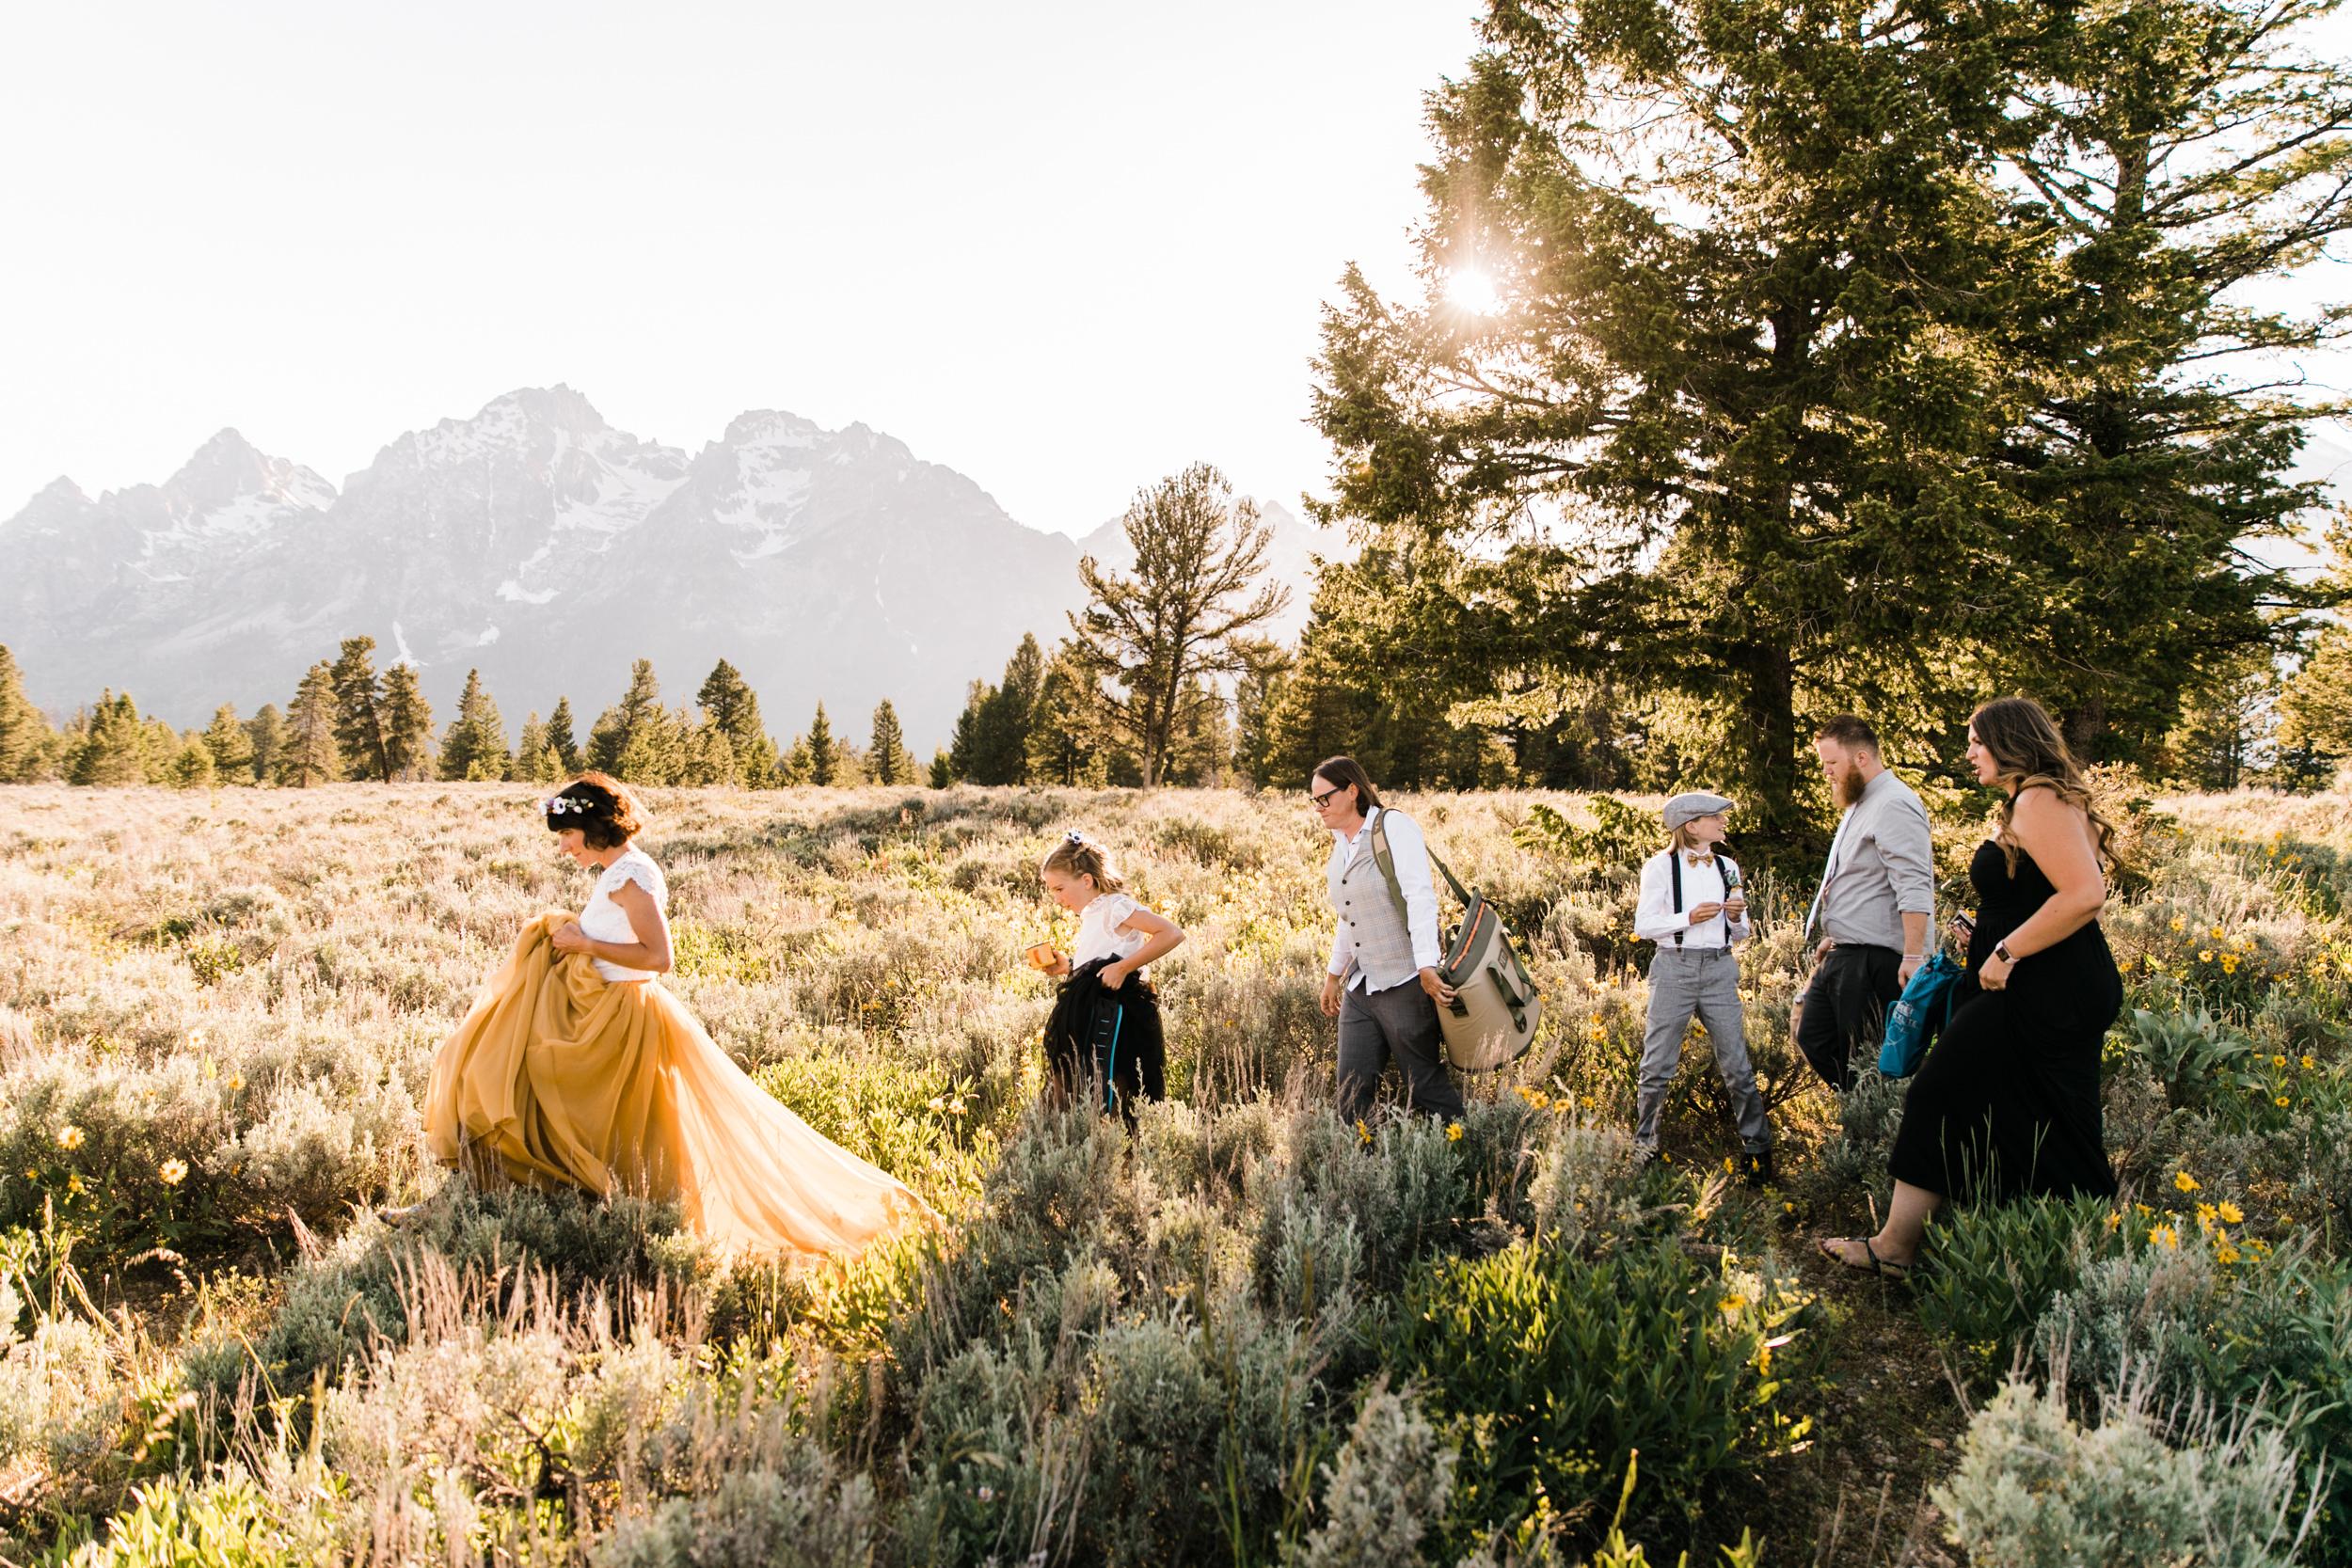 jen + amanda's intimate elopement in grand teton national park | jackson, wyoming wedding photographer | the hearnes adventure photography | www.thehearnes.com